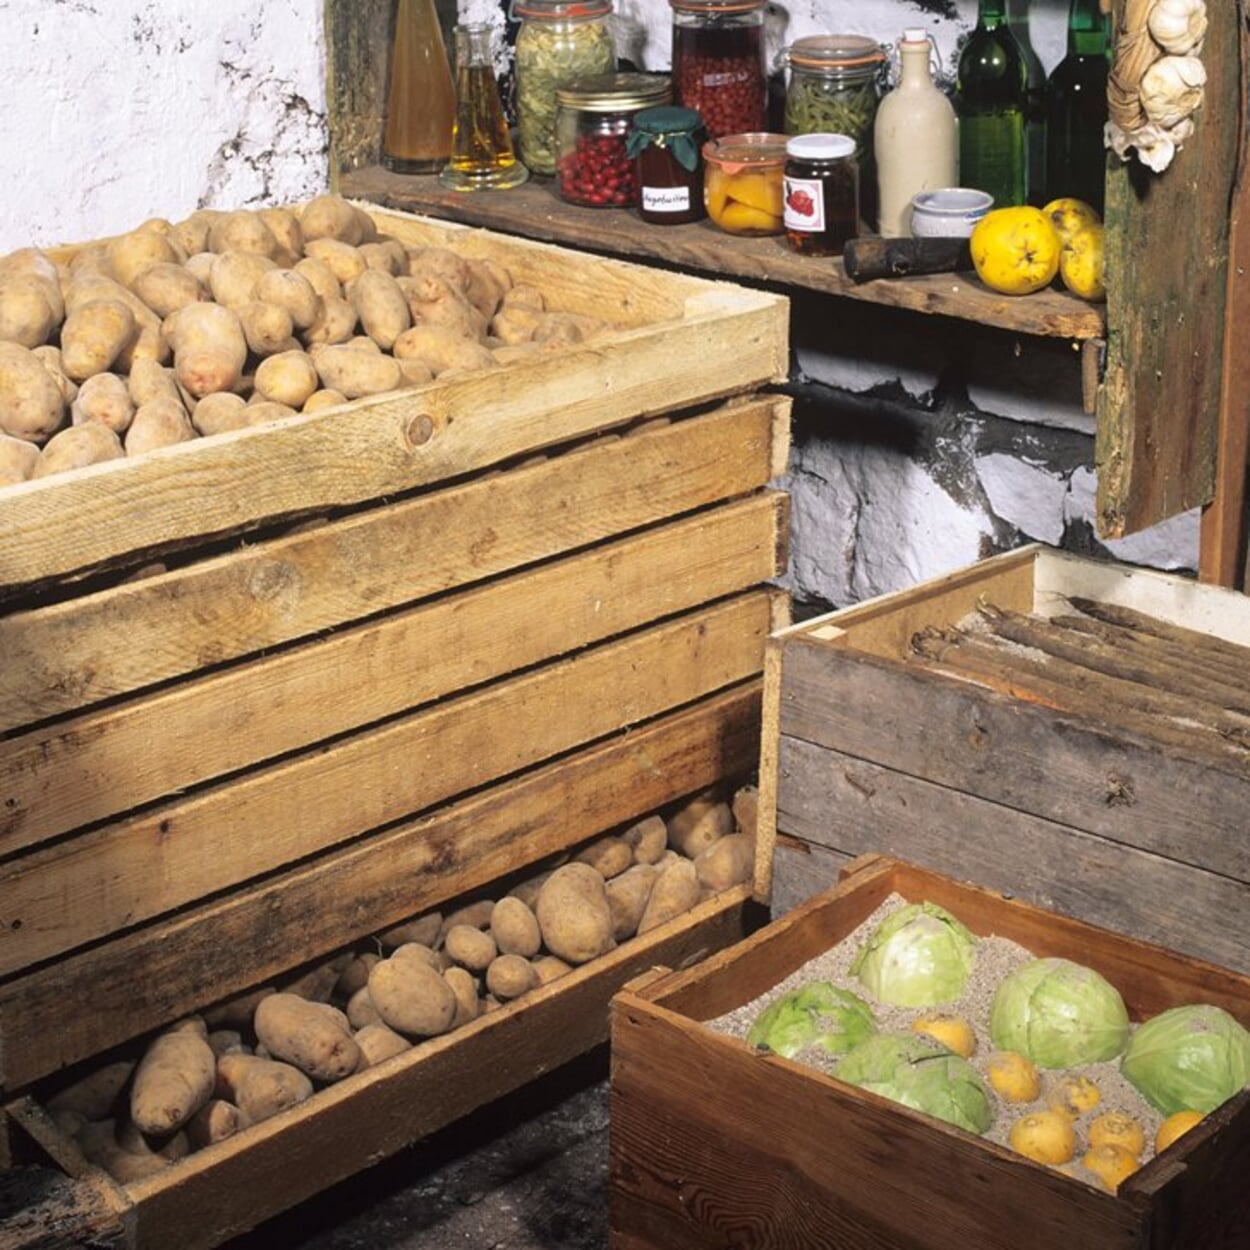 Kartoffeln in Kisten kühl lagern